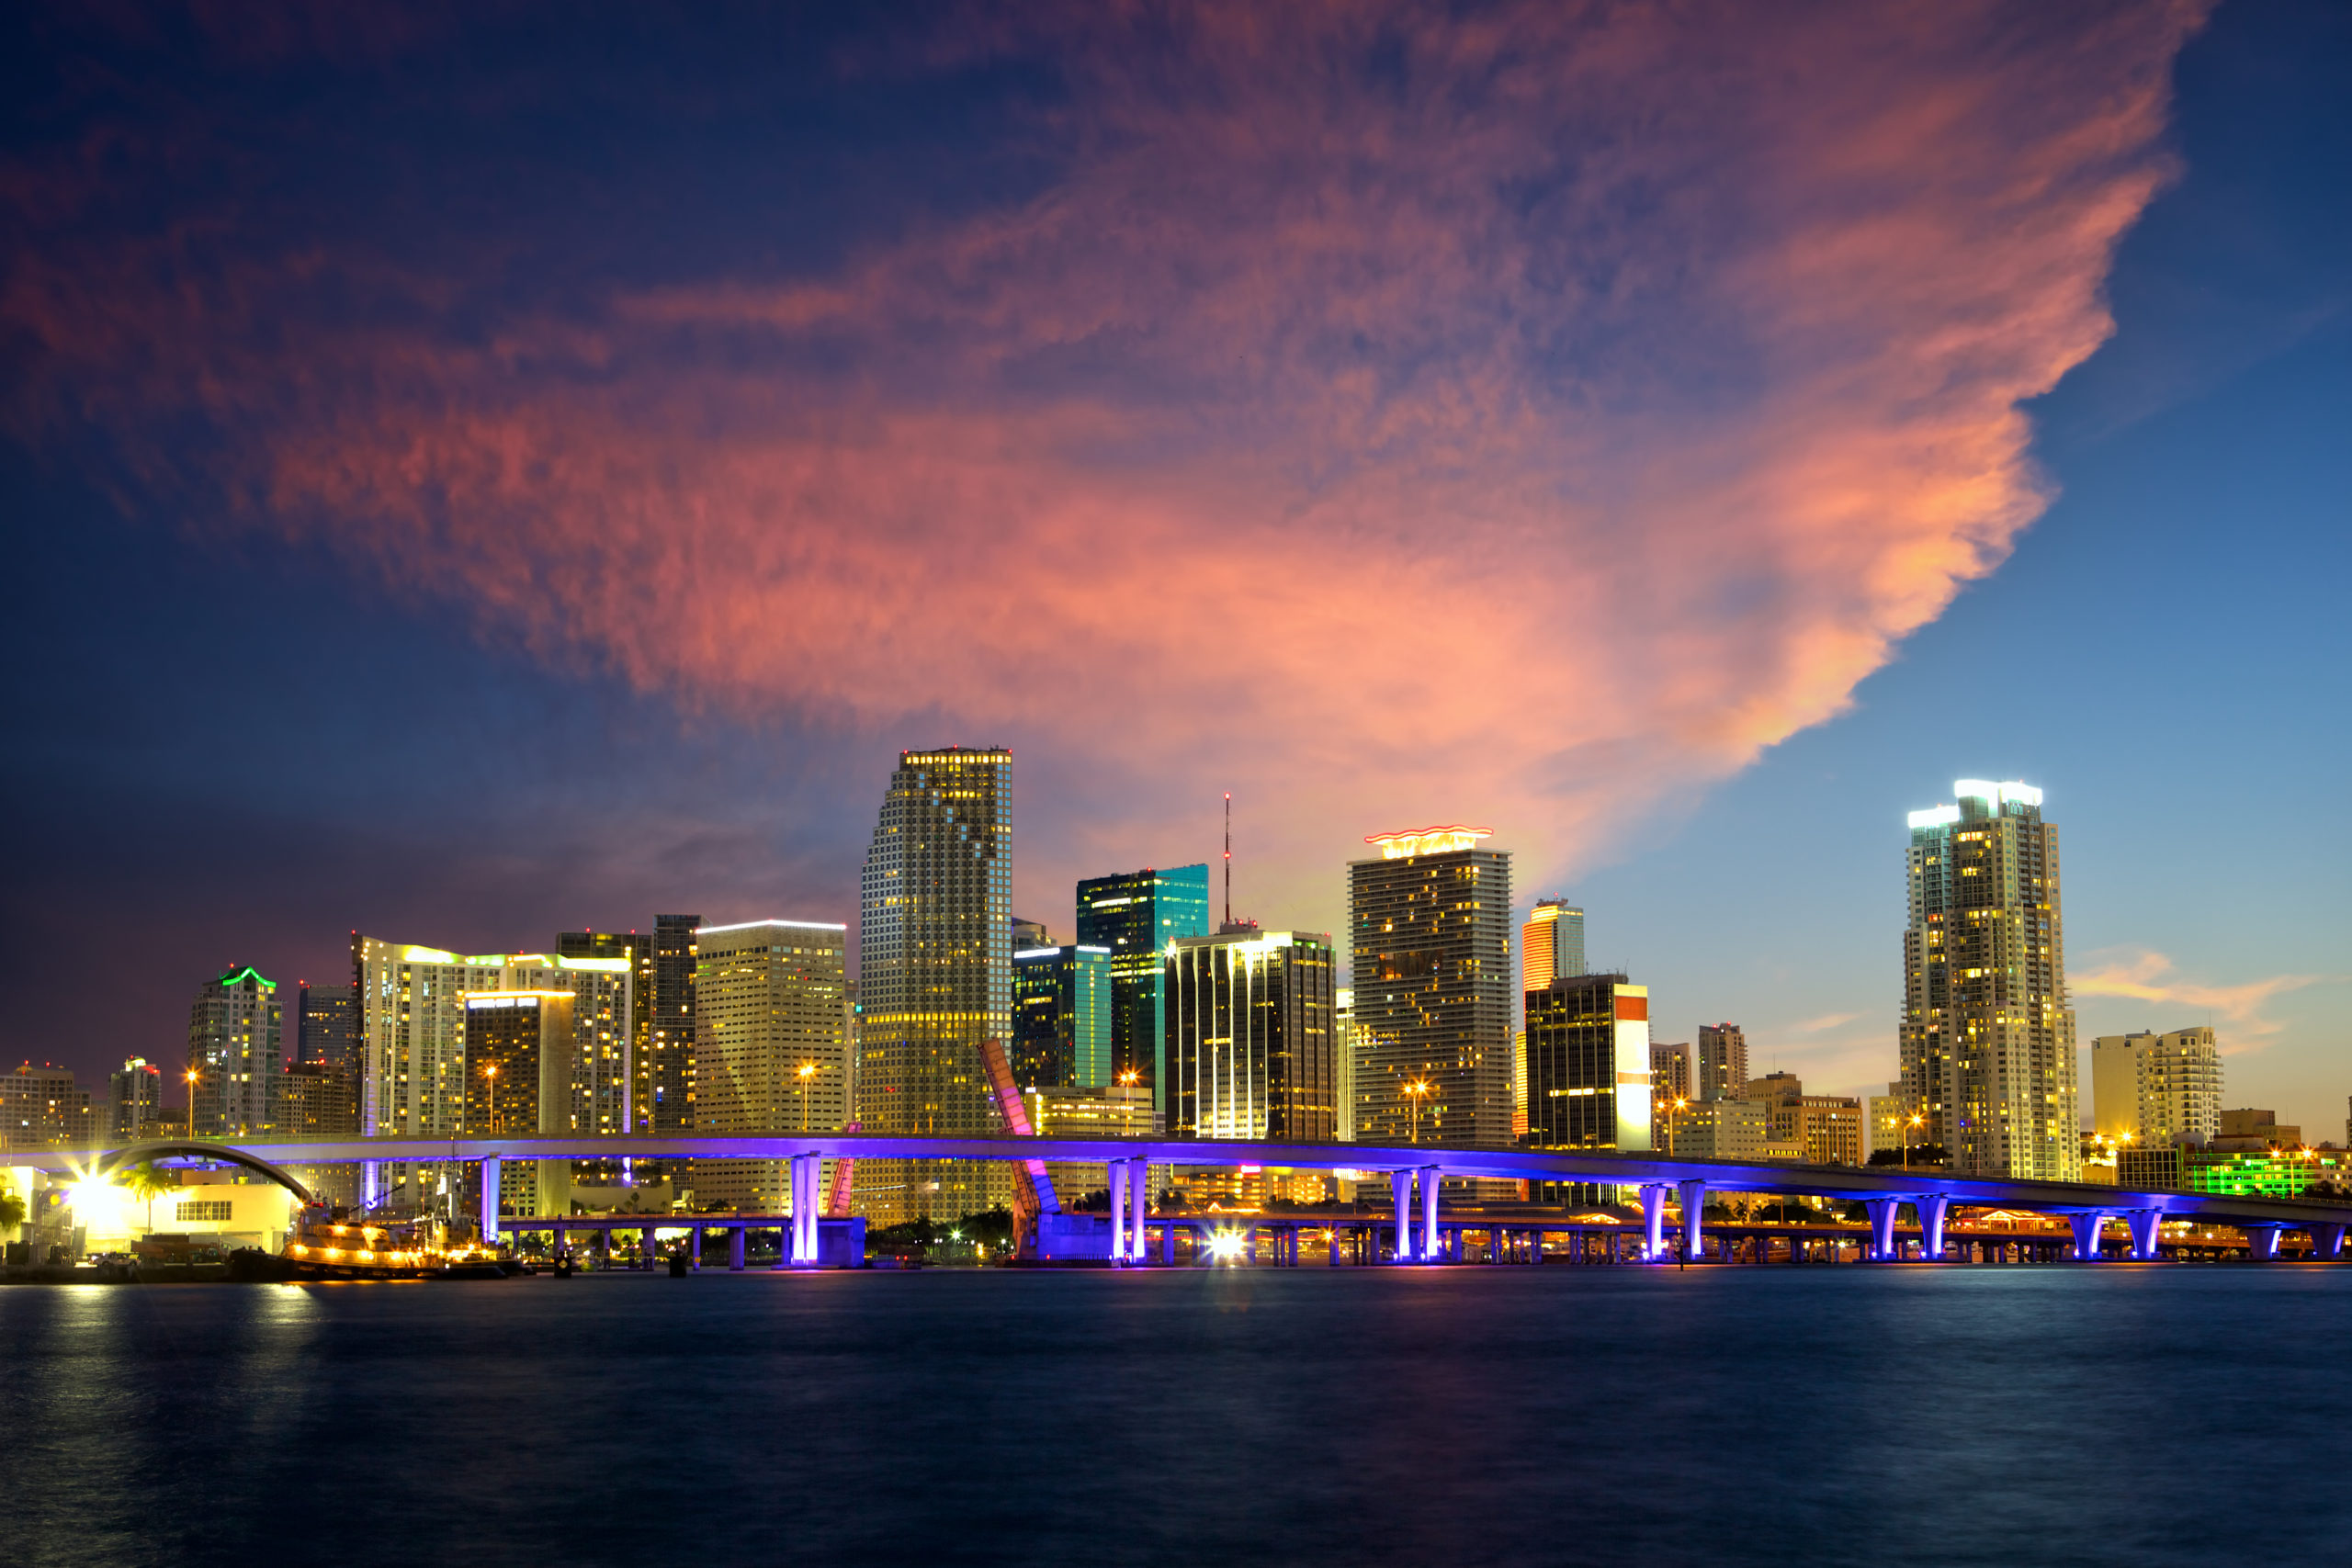 Downtown Miami skyline at dusk, Florida, US